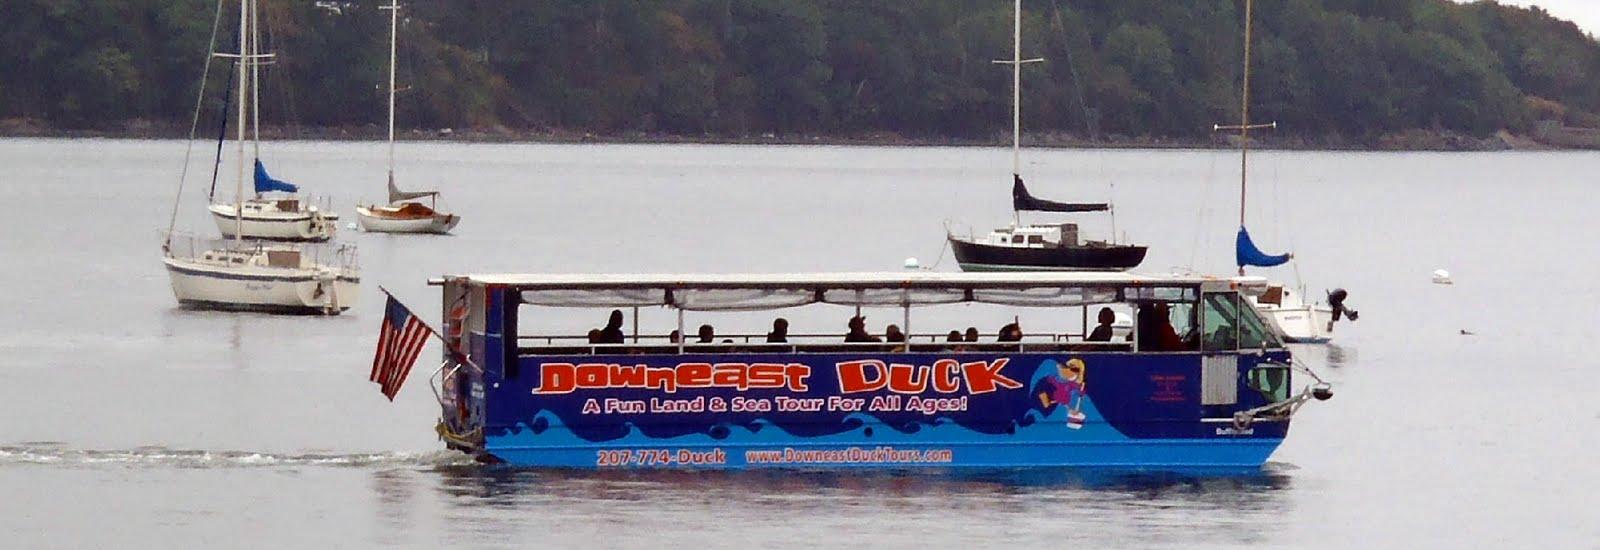 The Duck Tour Portland Maine